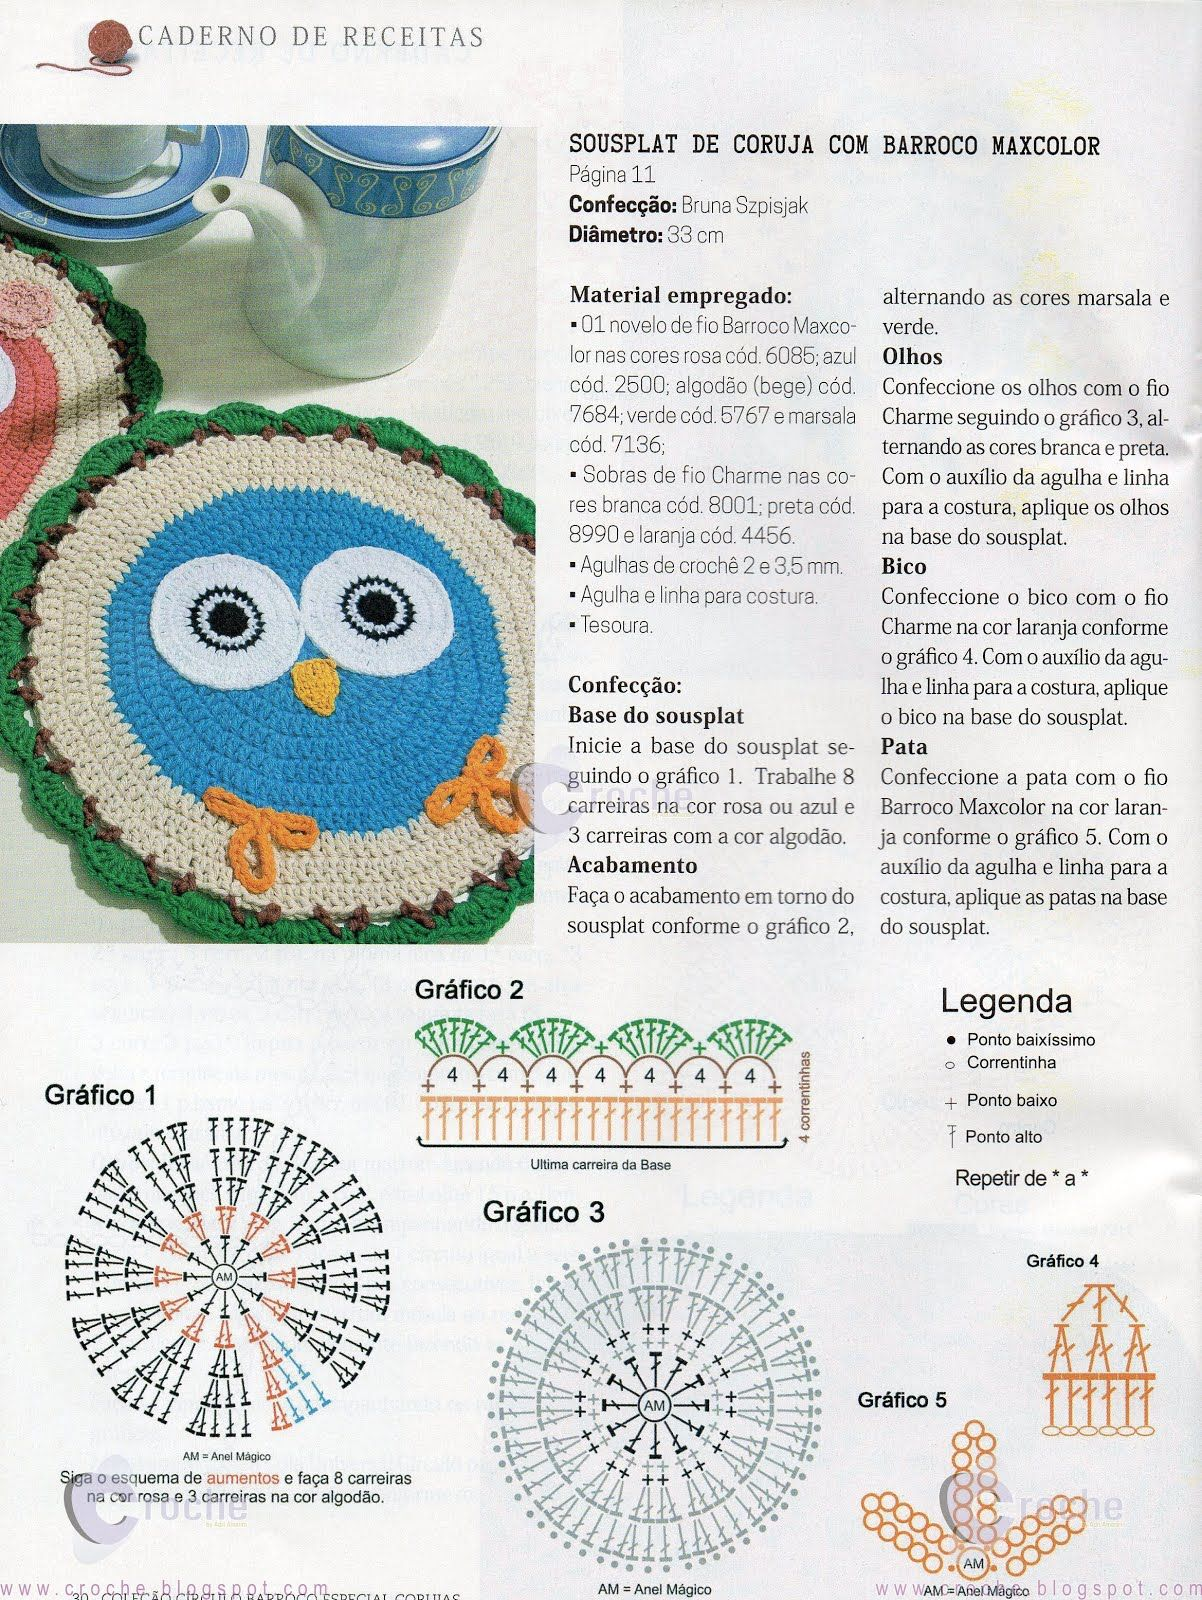 Receitas do Croche Croche!: Sousplat coruja | crochet | Pinterest ...